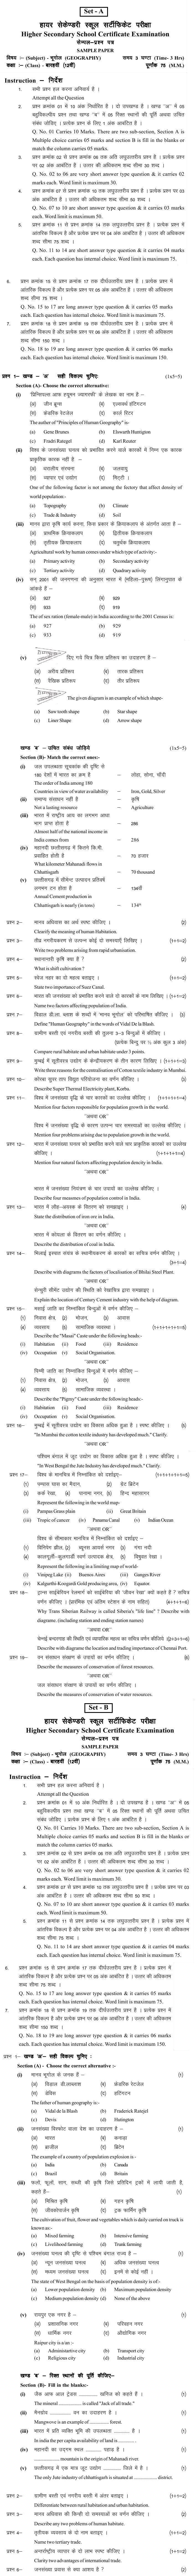 Chattisgarh Board Class 12 GeographySample Paper